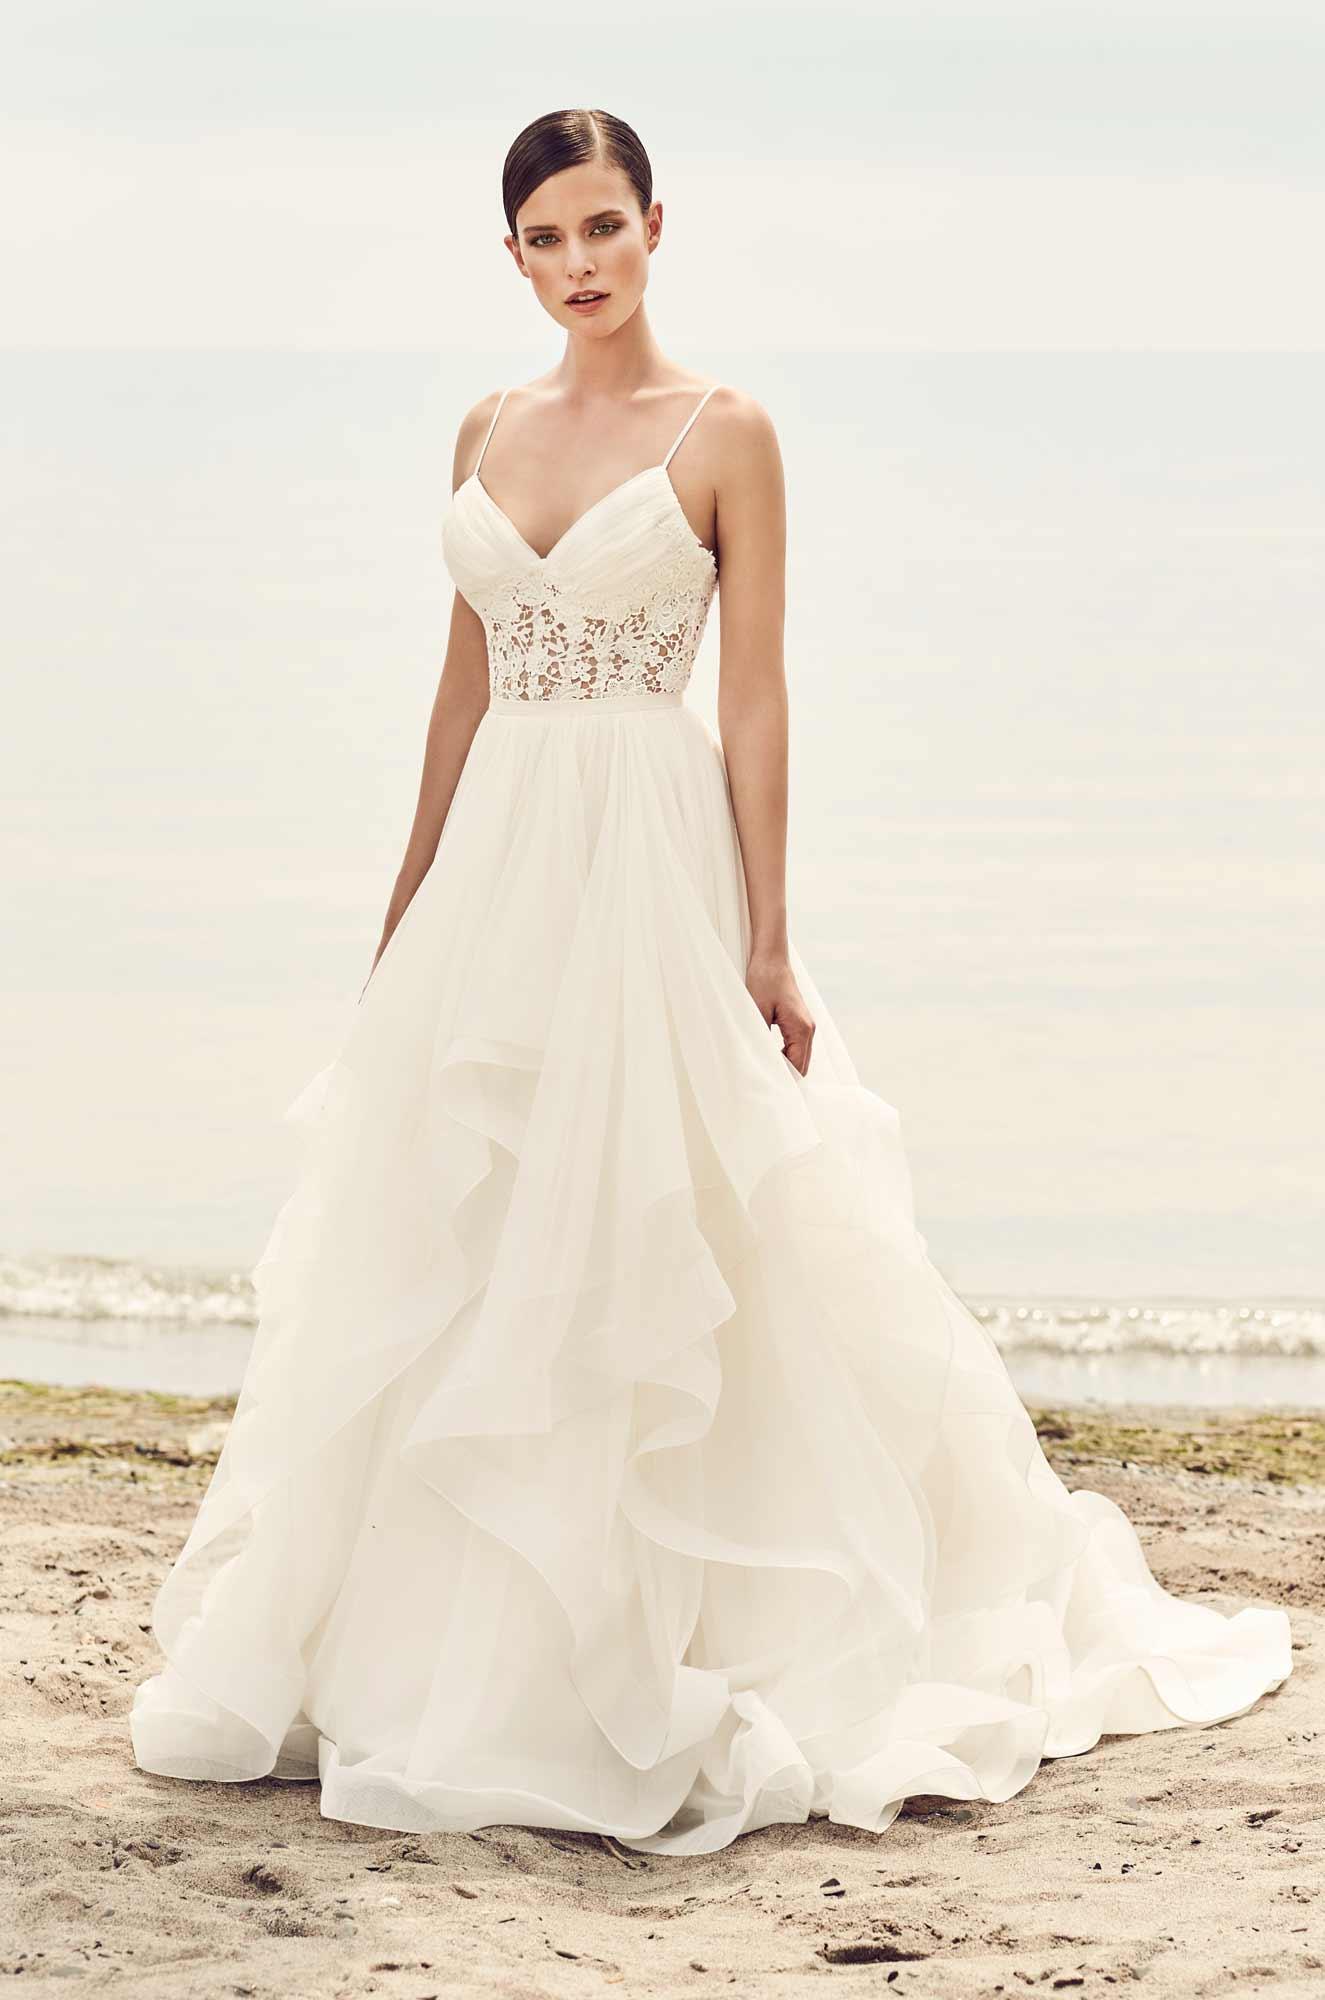 Whimsical Tulle Skirt Wedding Dress - Style #2101 | Mikaella Bridal